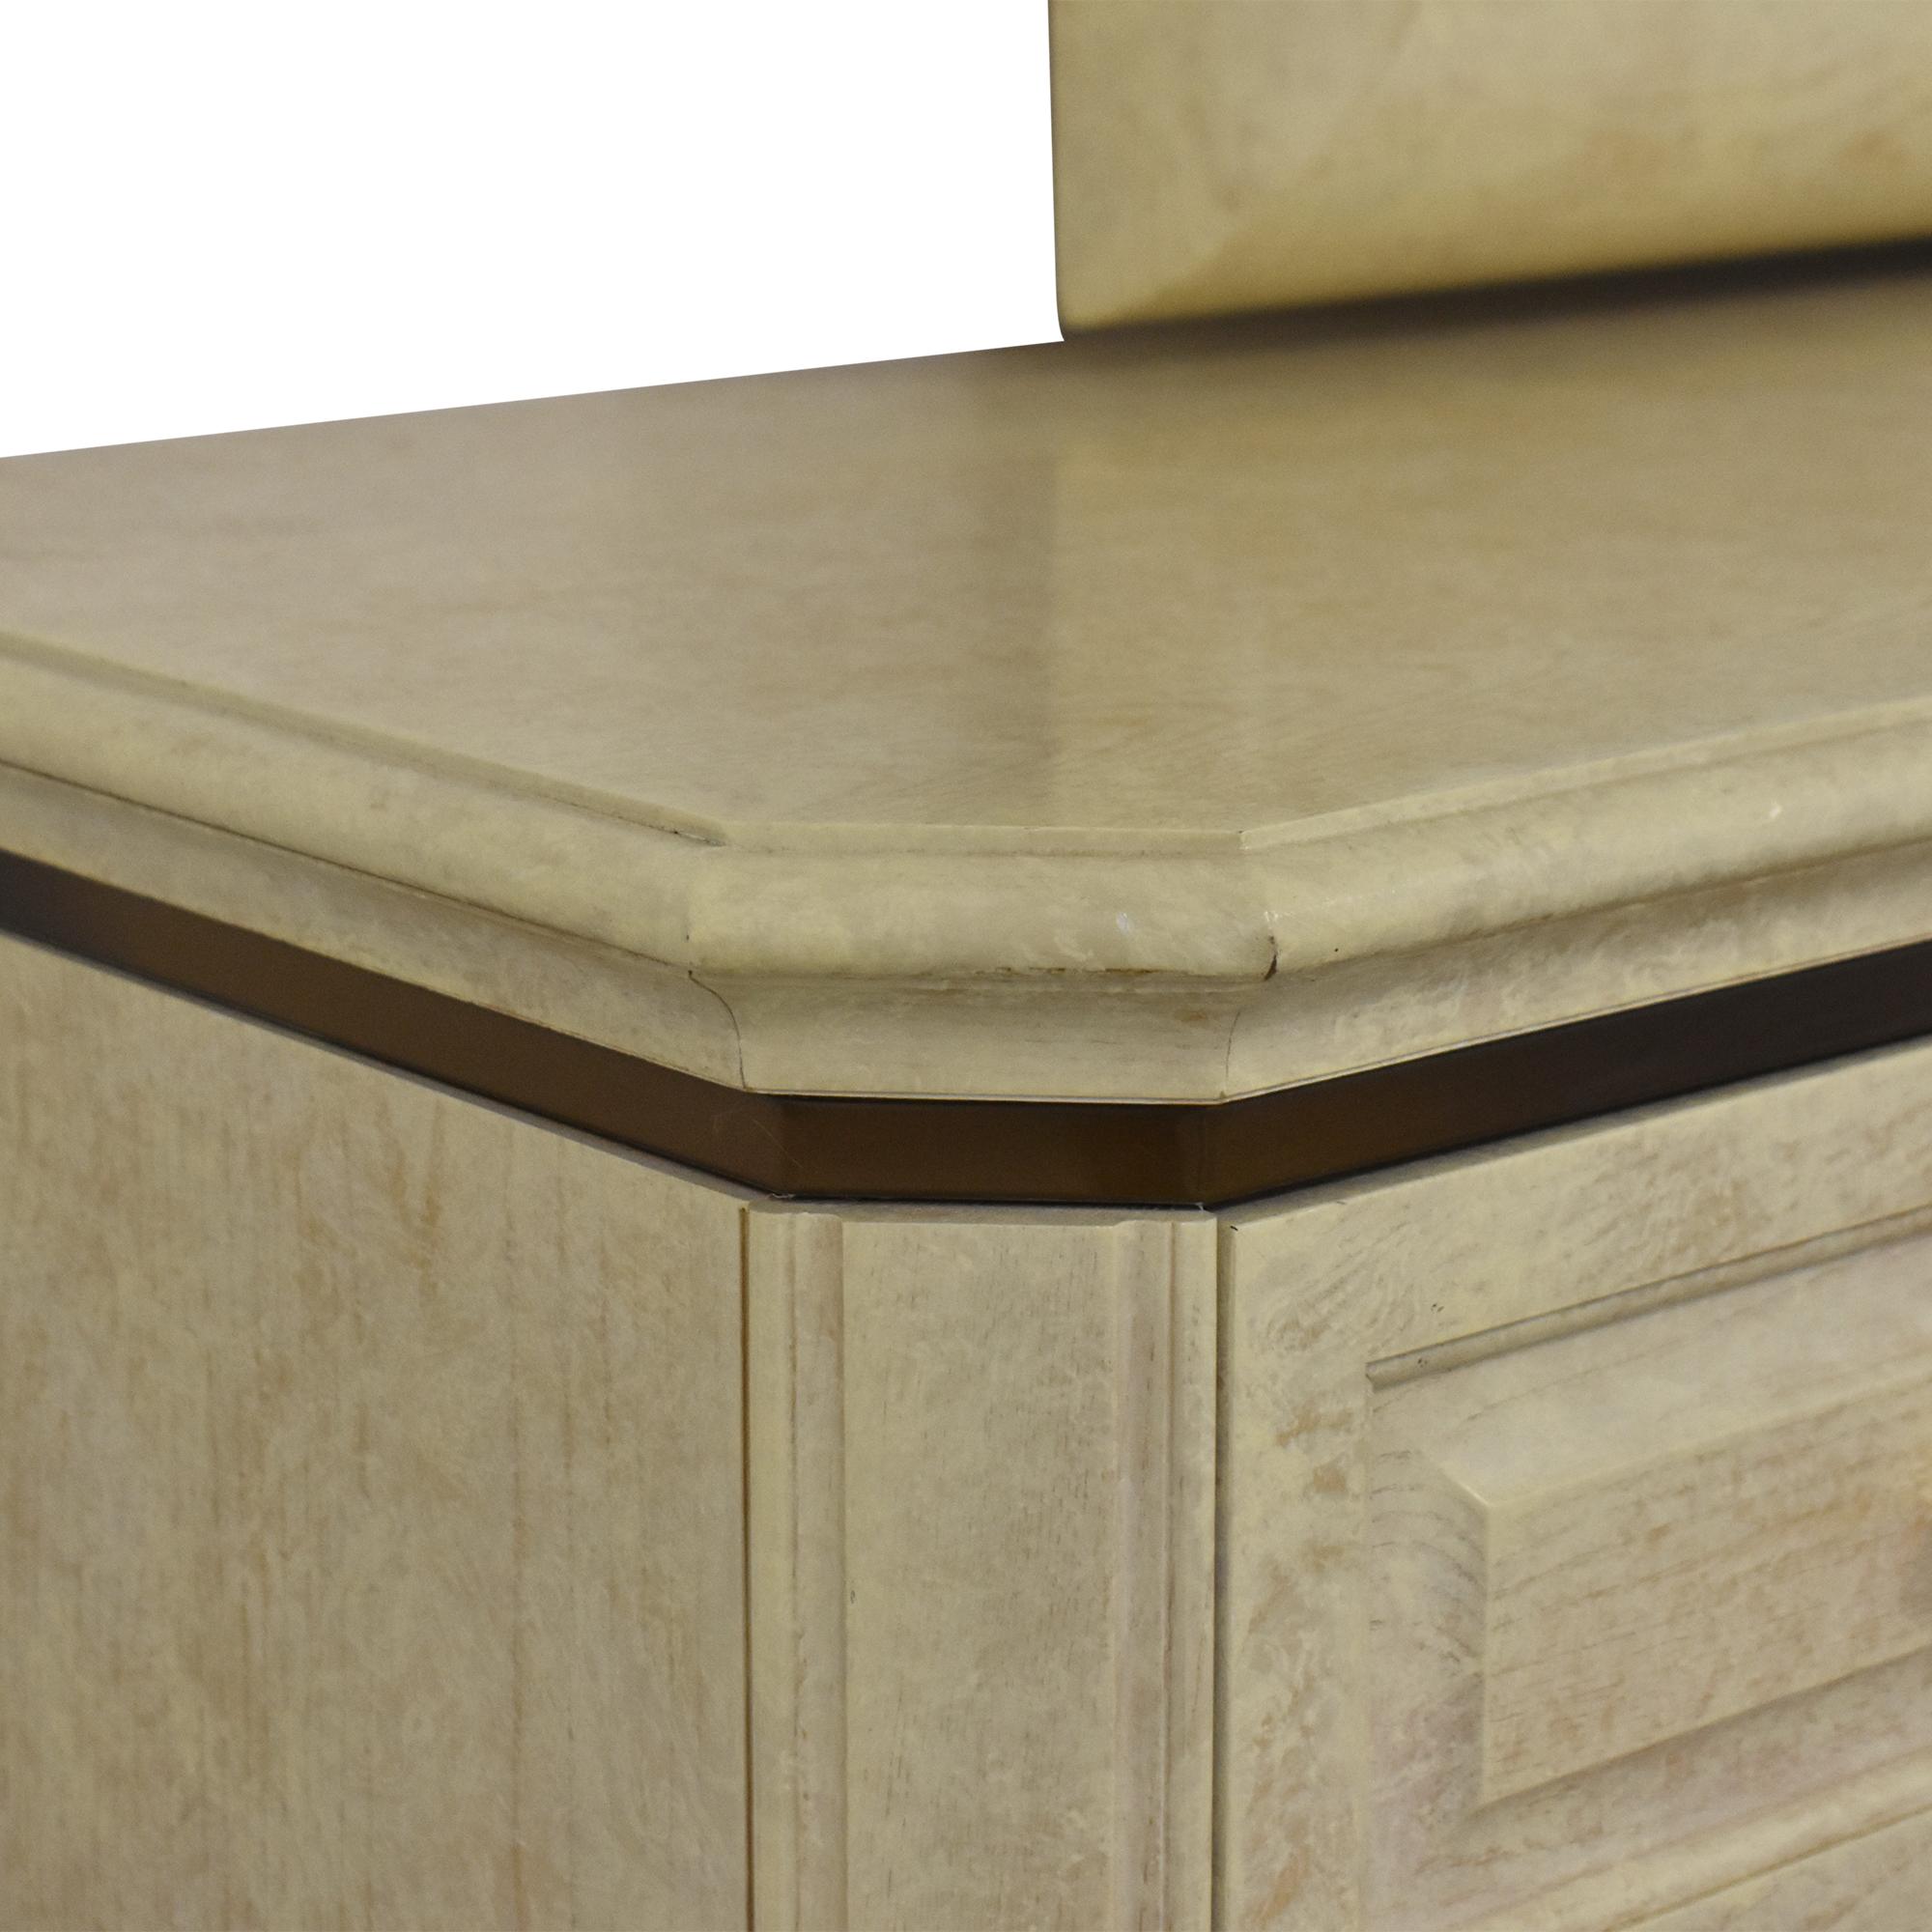 Henredon Furniture Henredon Art Deco Style Dresser and Mirror Decor